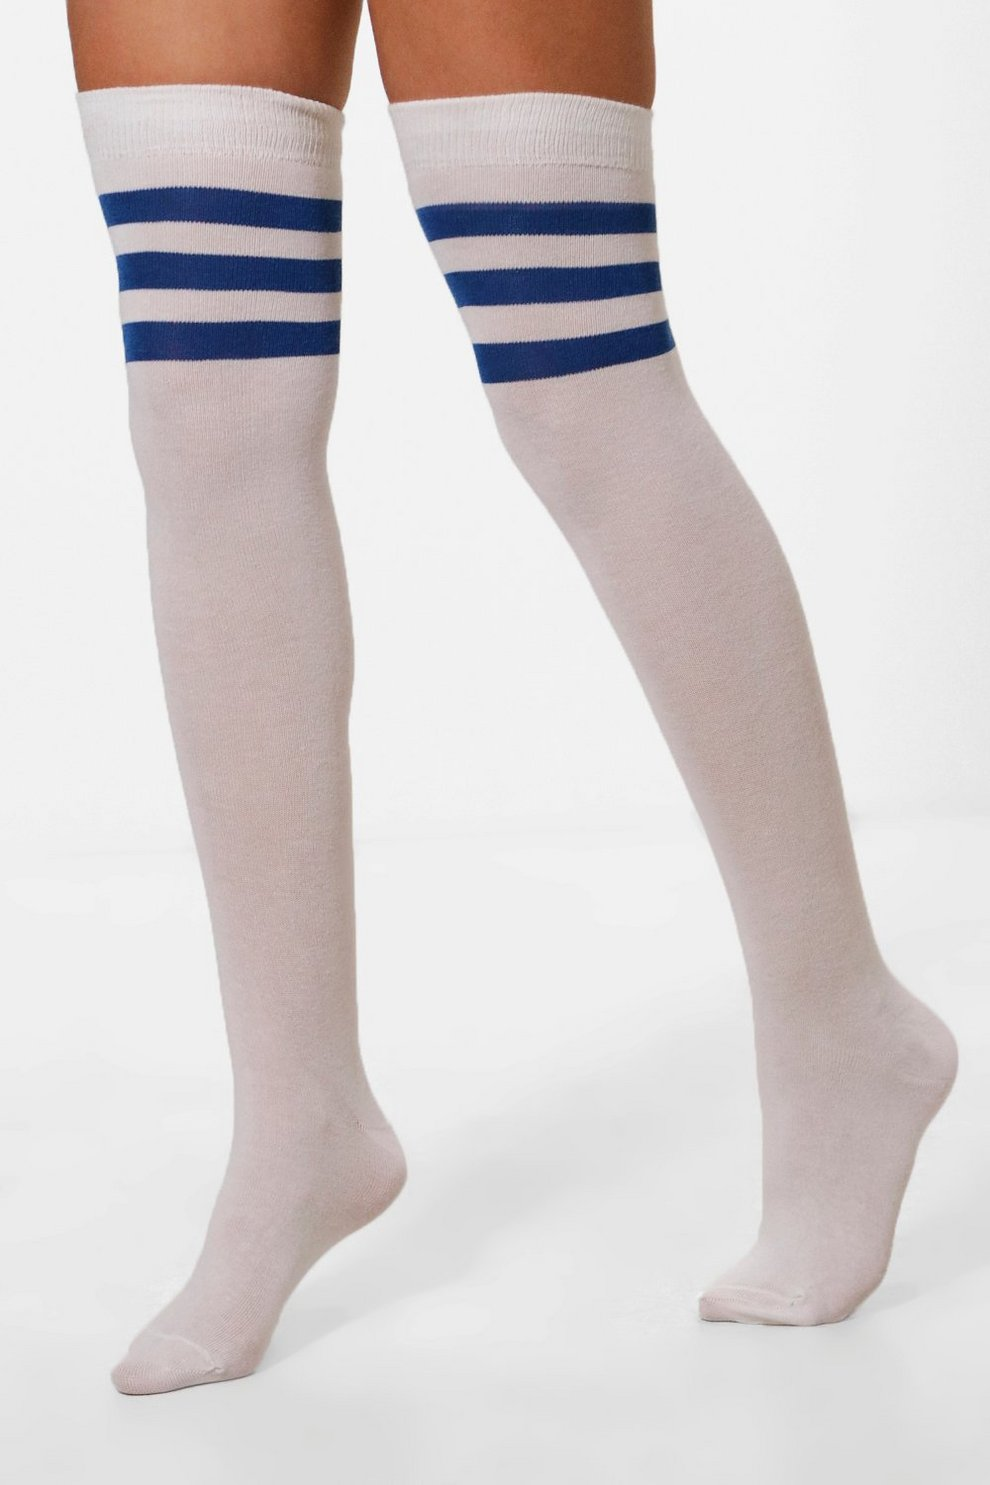 682543ada Stripe Top Knee High Socks   Boohoo